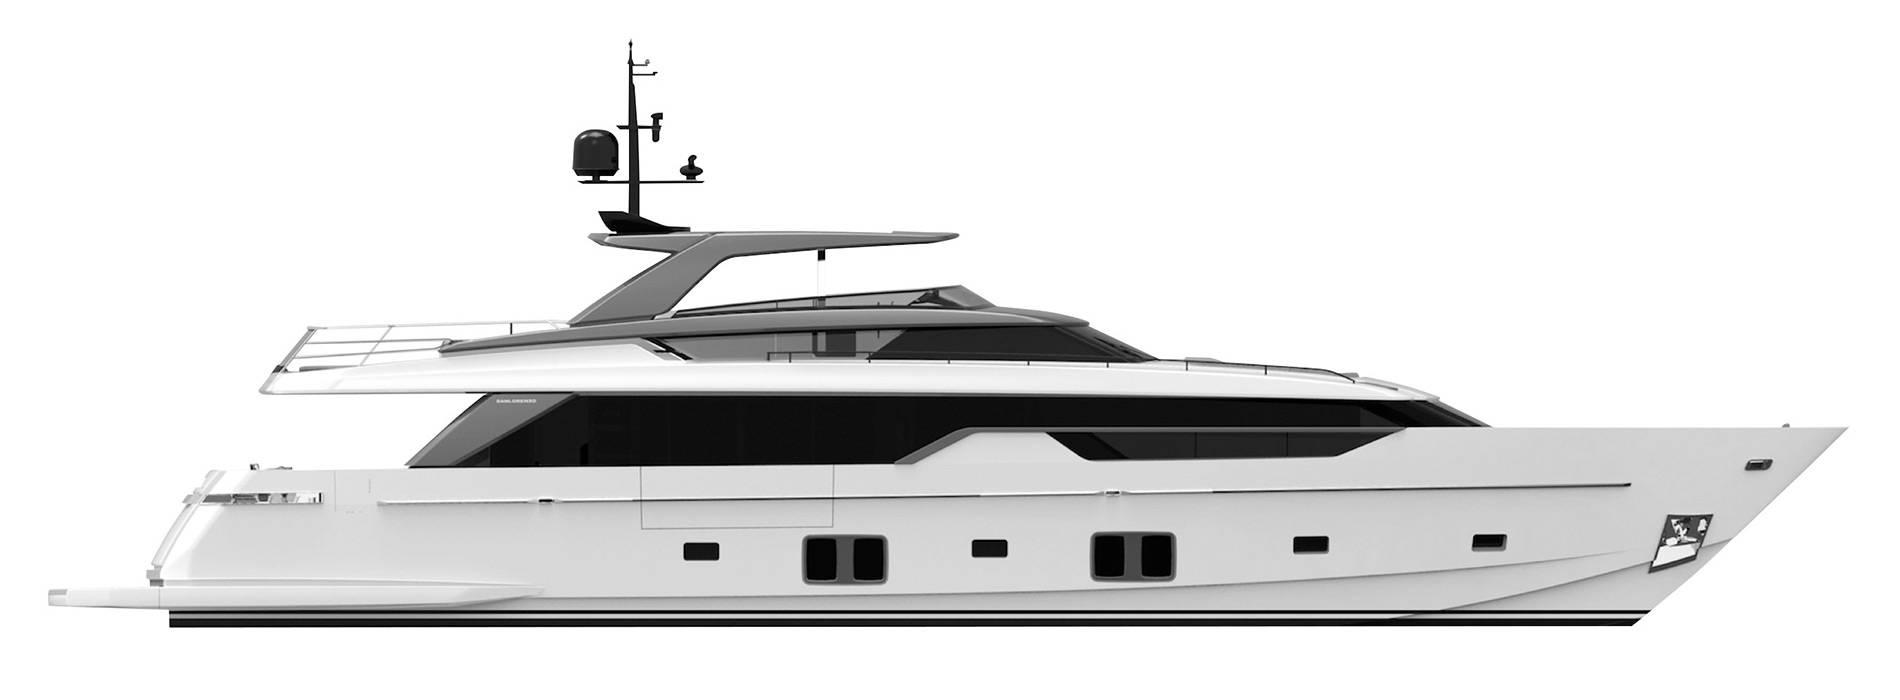 Sanlorenzo Yachts SL102 外观